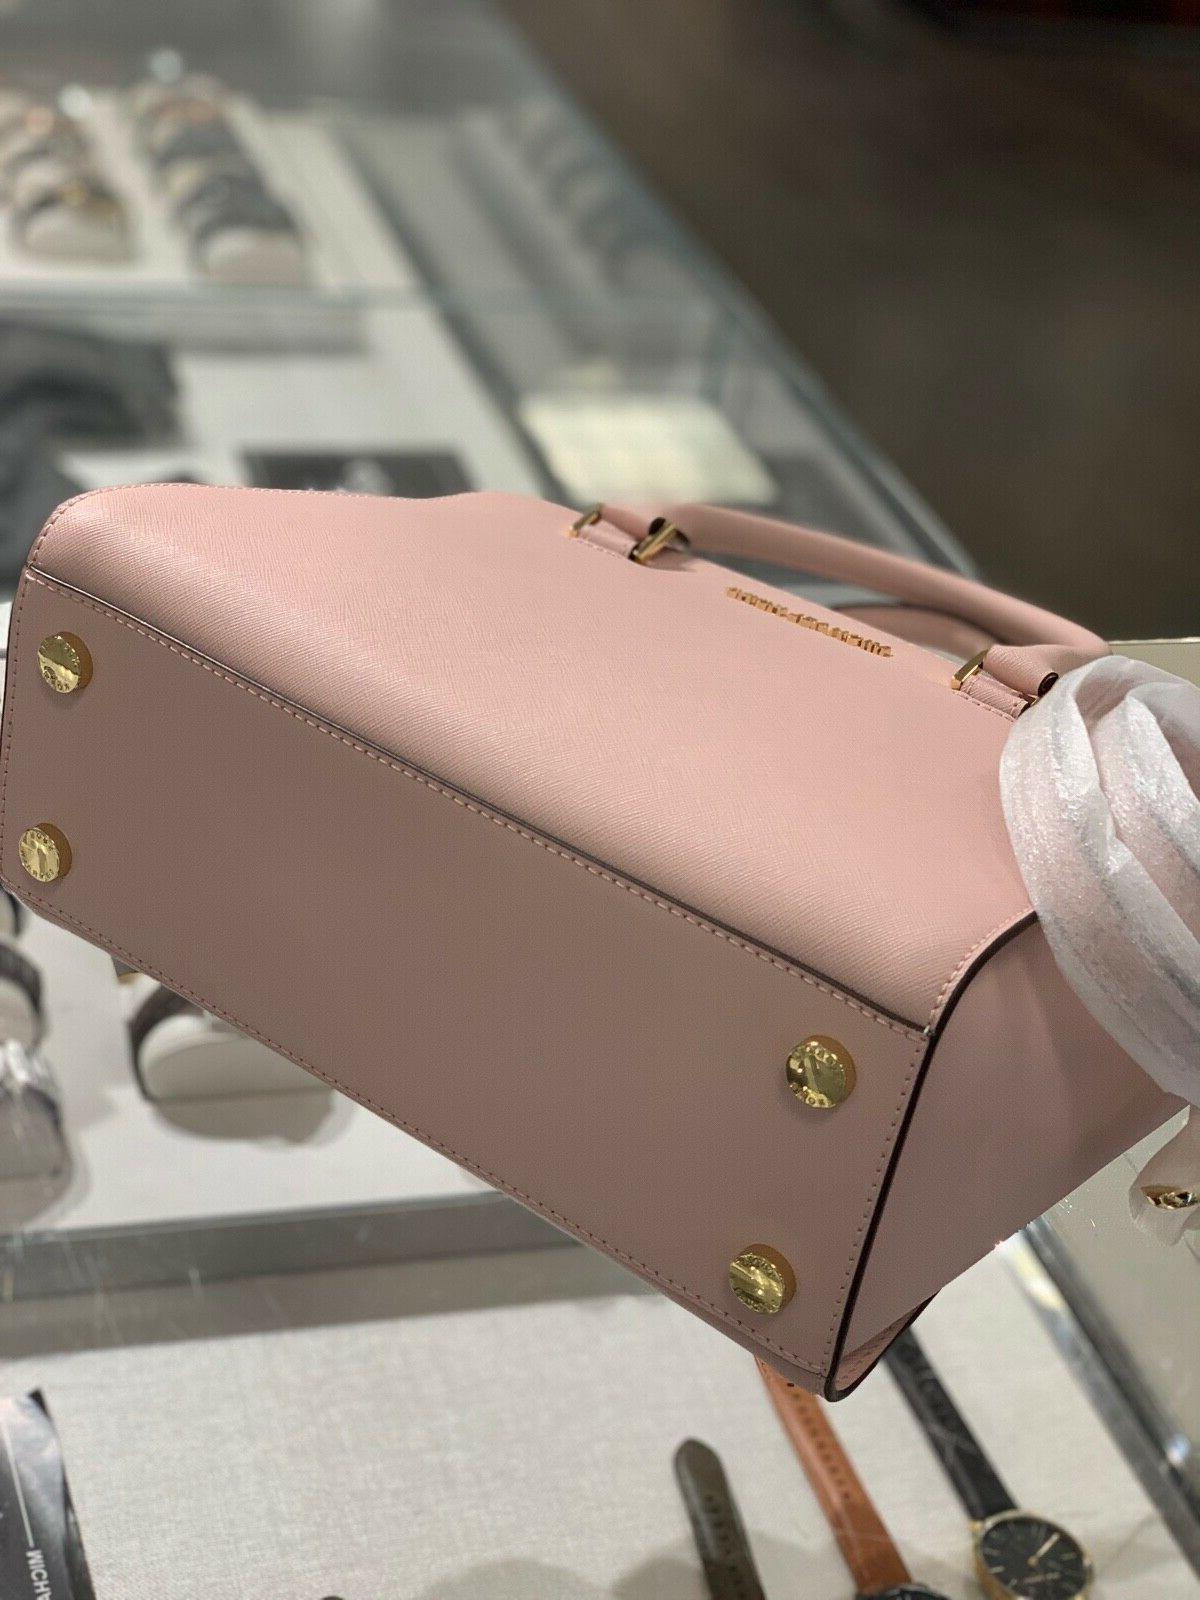 Michael Kors Leather Crossbody Handbag Shoulder